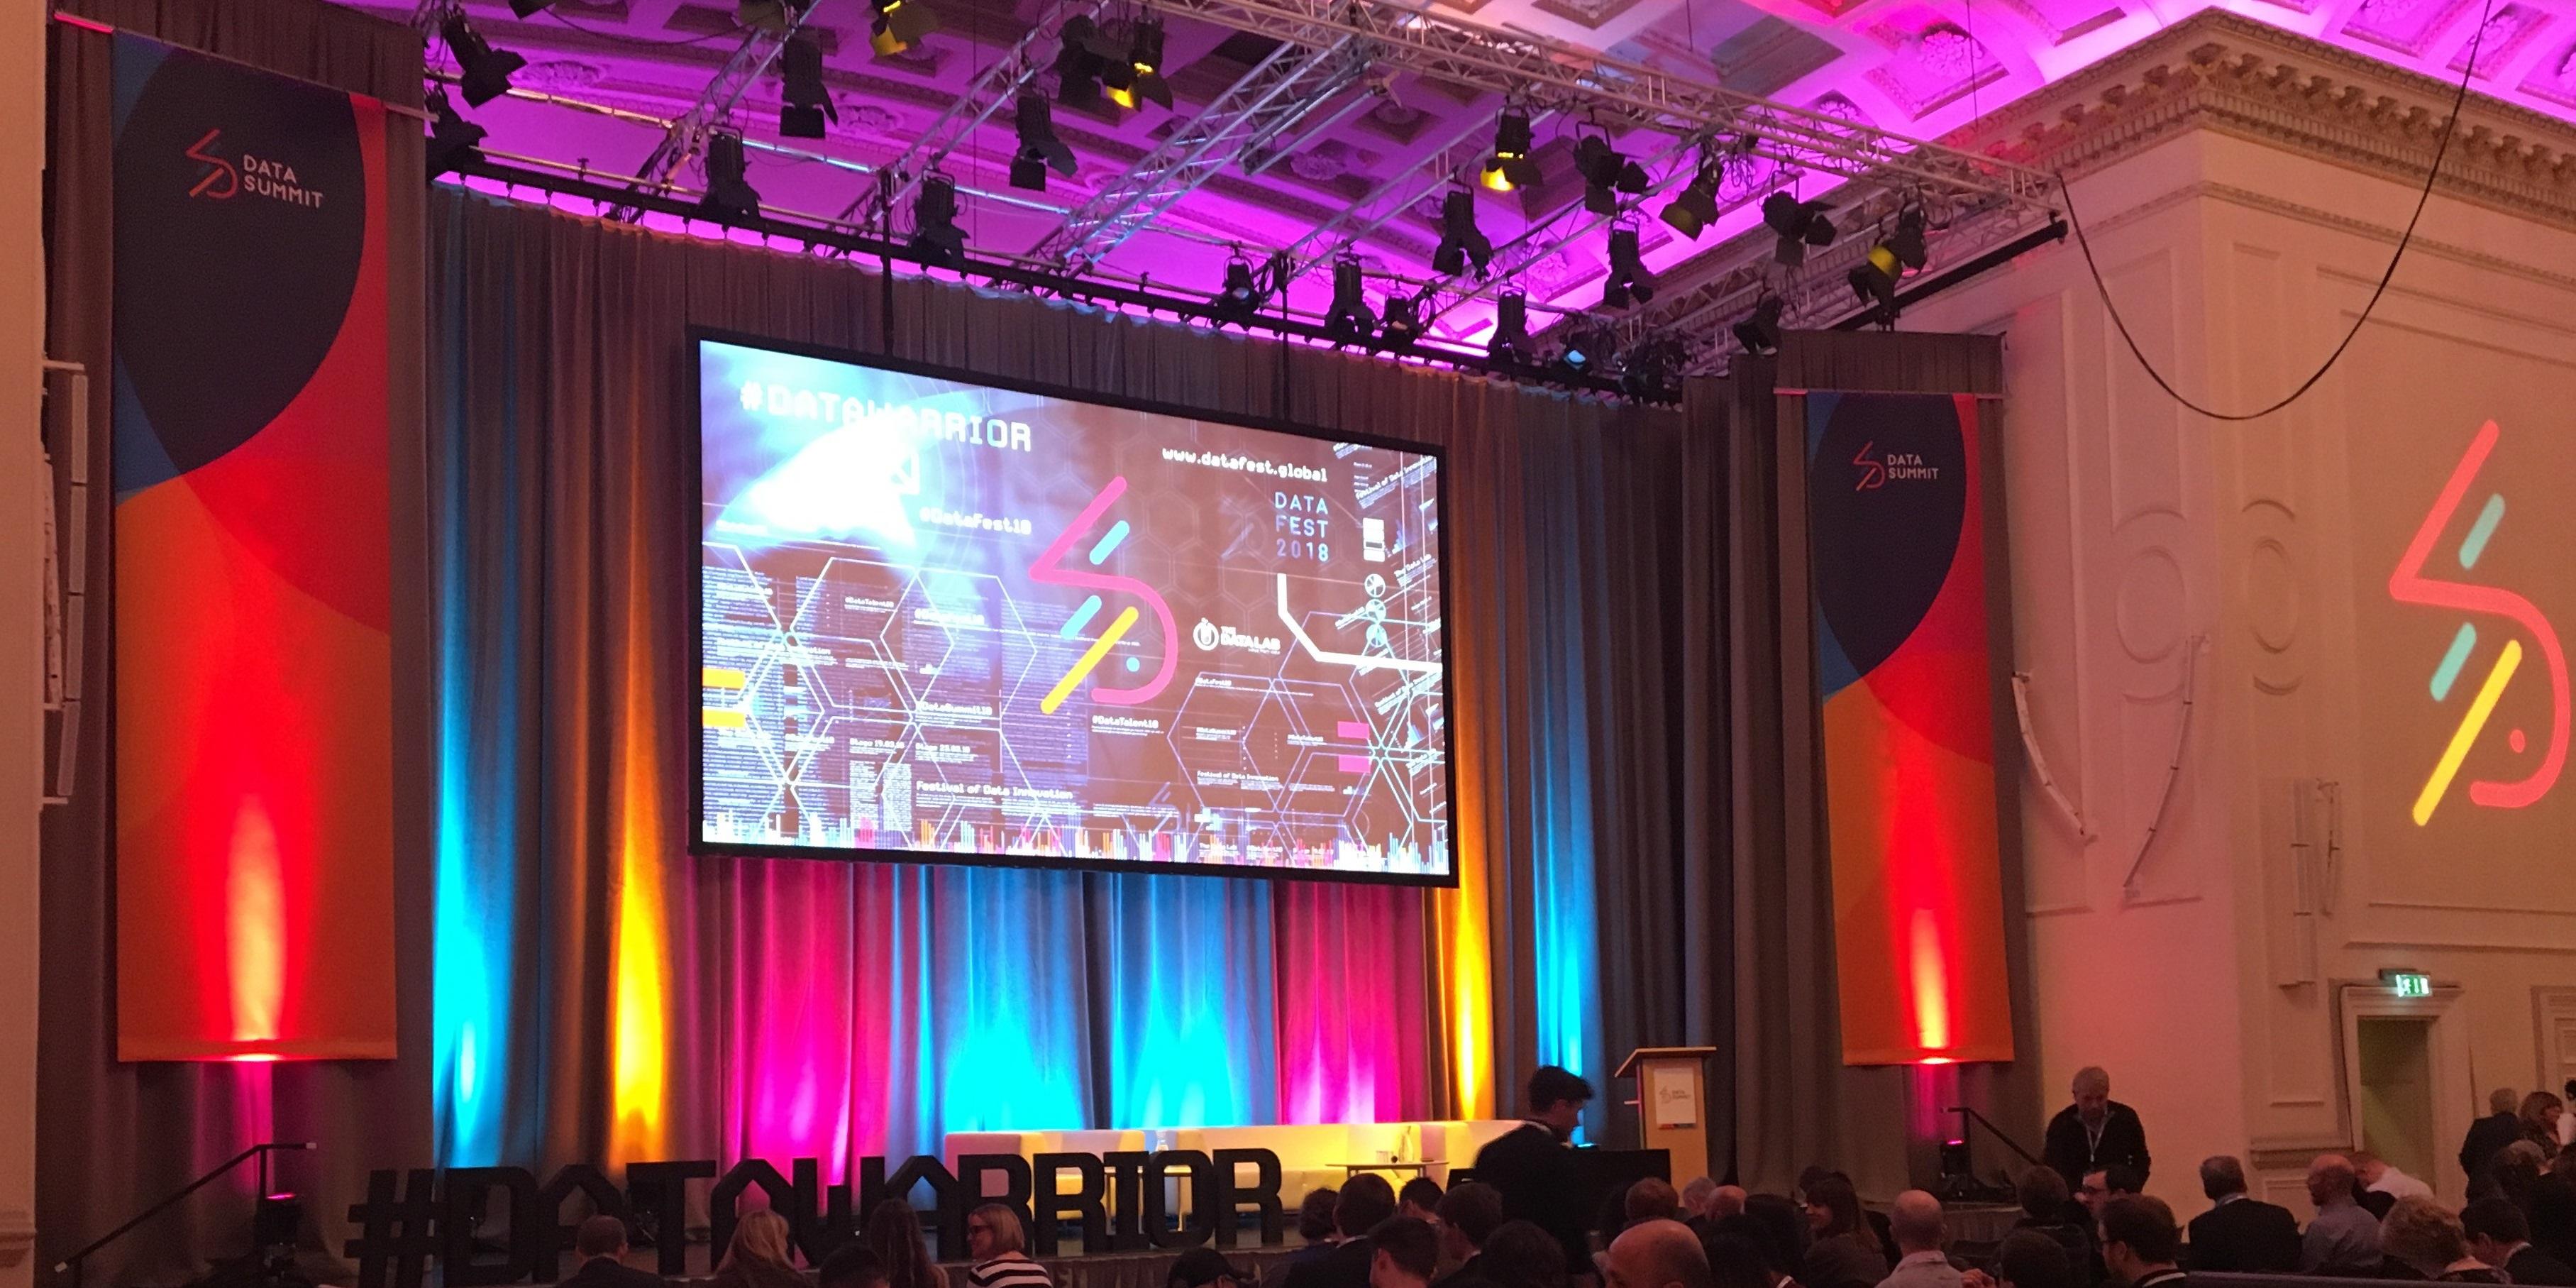 Data Summit - Business Data Partners Blog